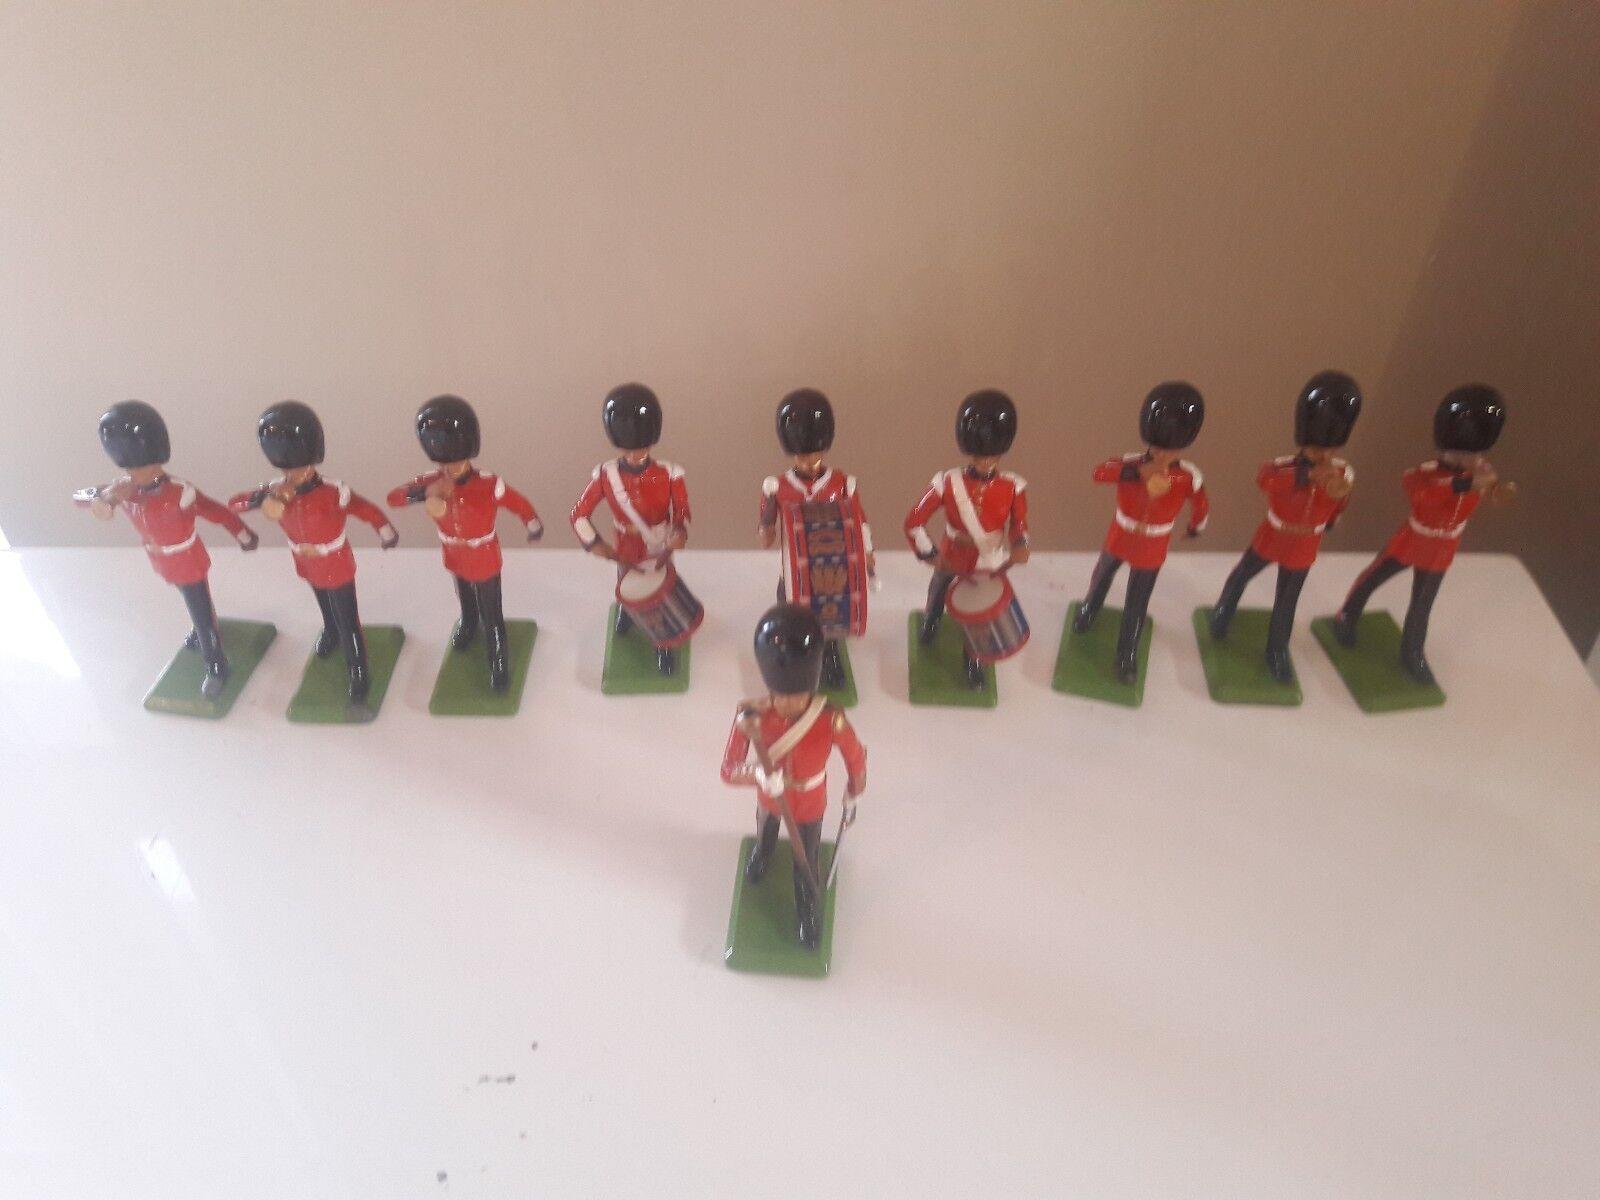 Britains ceremonial  scots guards band royal wedding  boxed 1980s 1 32 7206